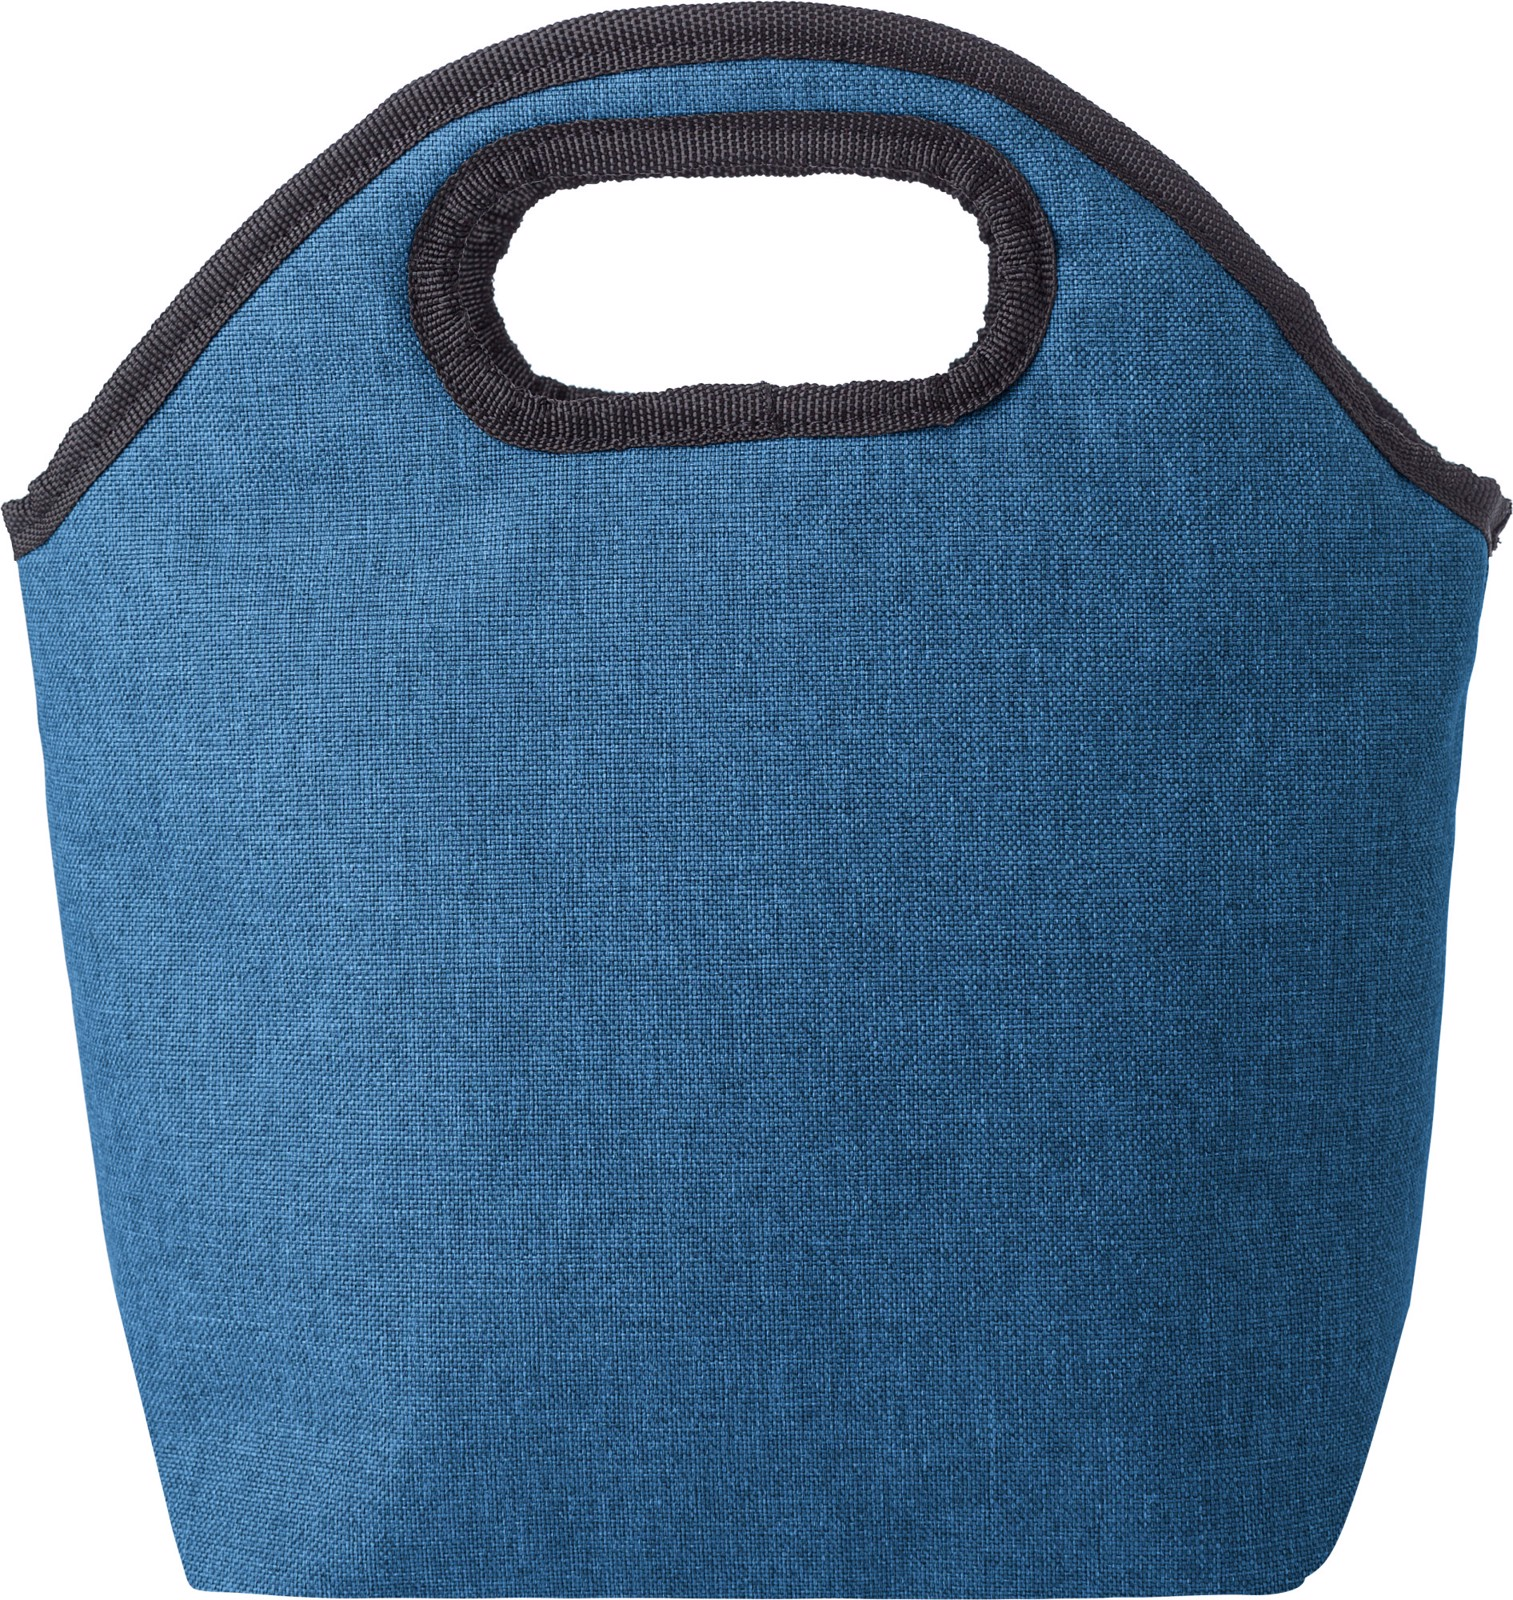 Polycanvas (600D) cooler bag - Light Blue